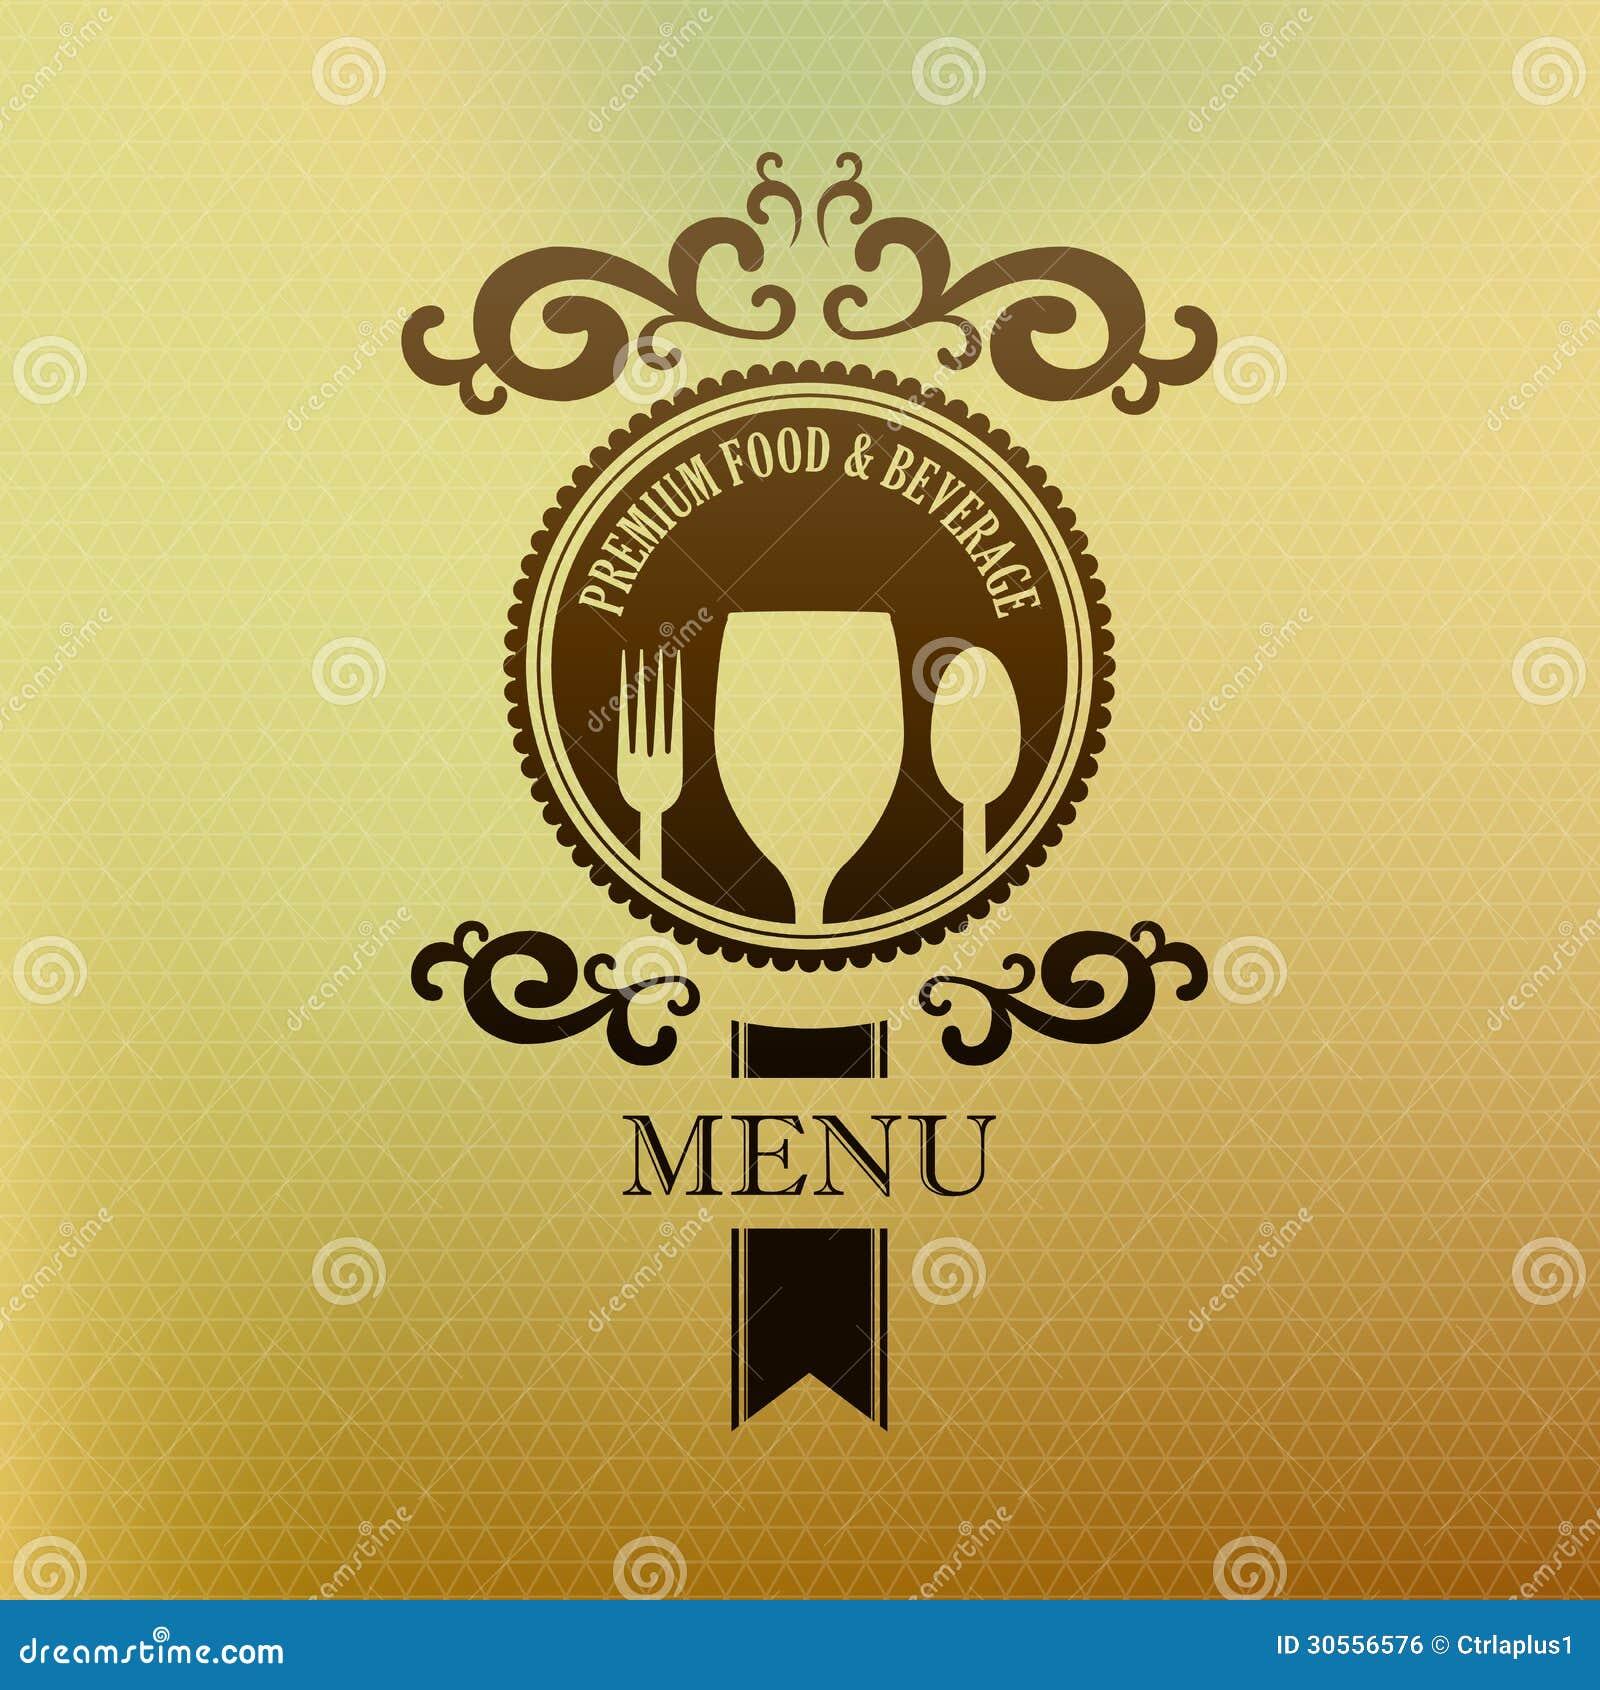 vintage label menu food and beverage cover stock vector